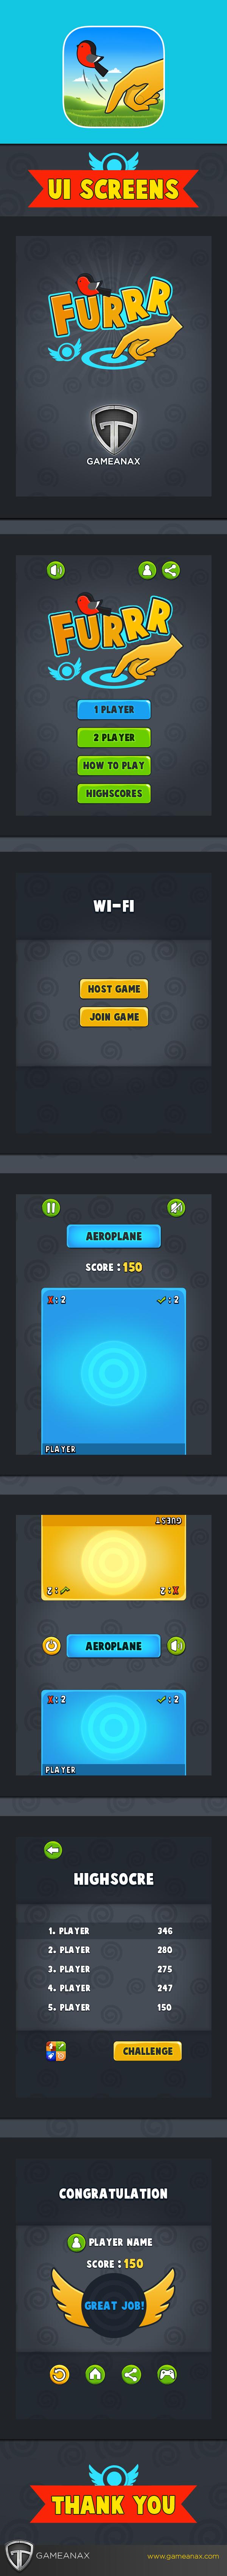 Gaming user interface iphone iPad mobile gaming